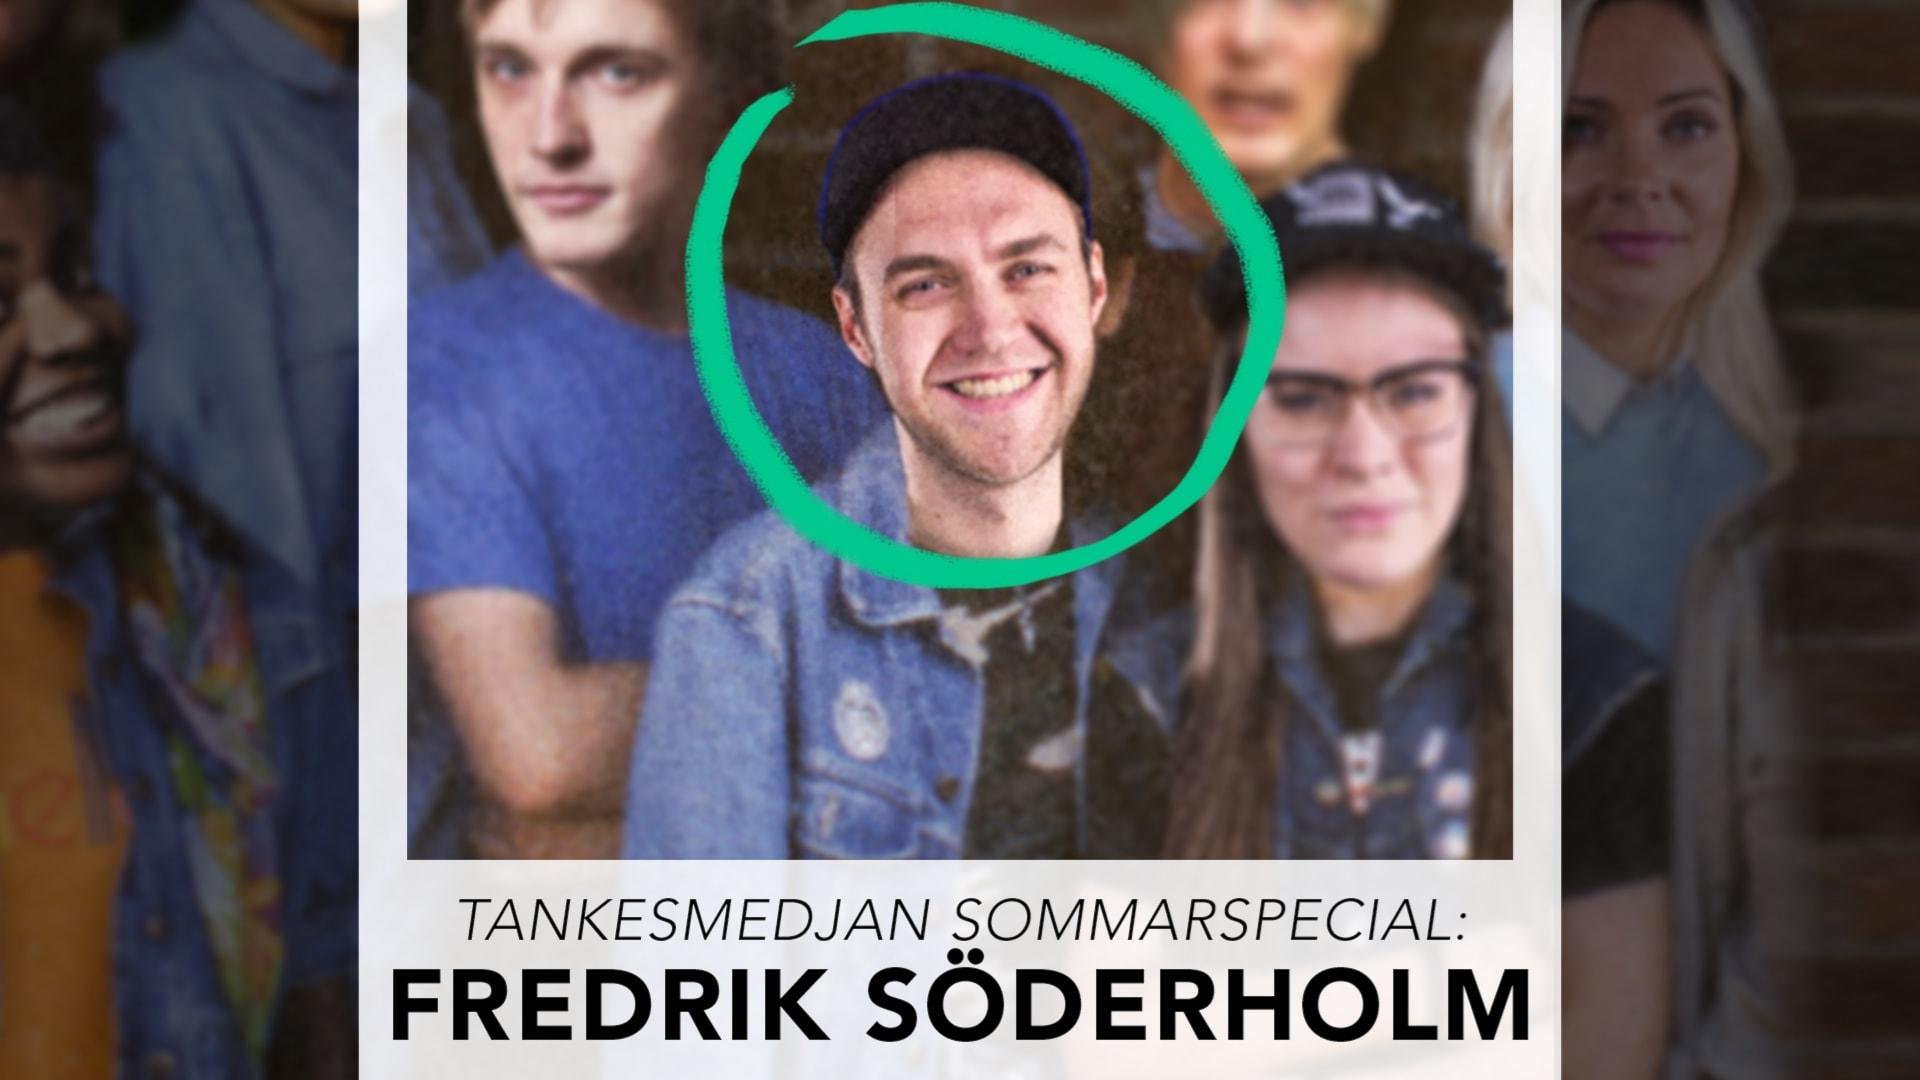 Tankesmedjan sommarspecial: Fredrik Söderholm!